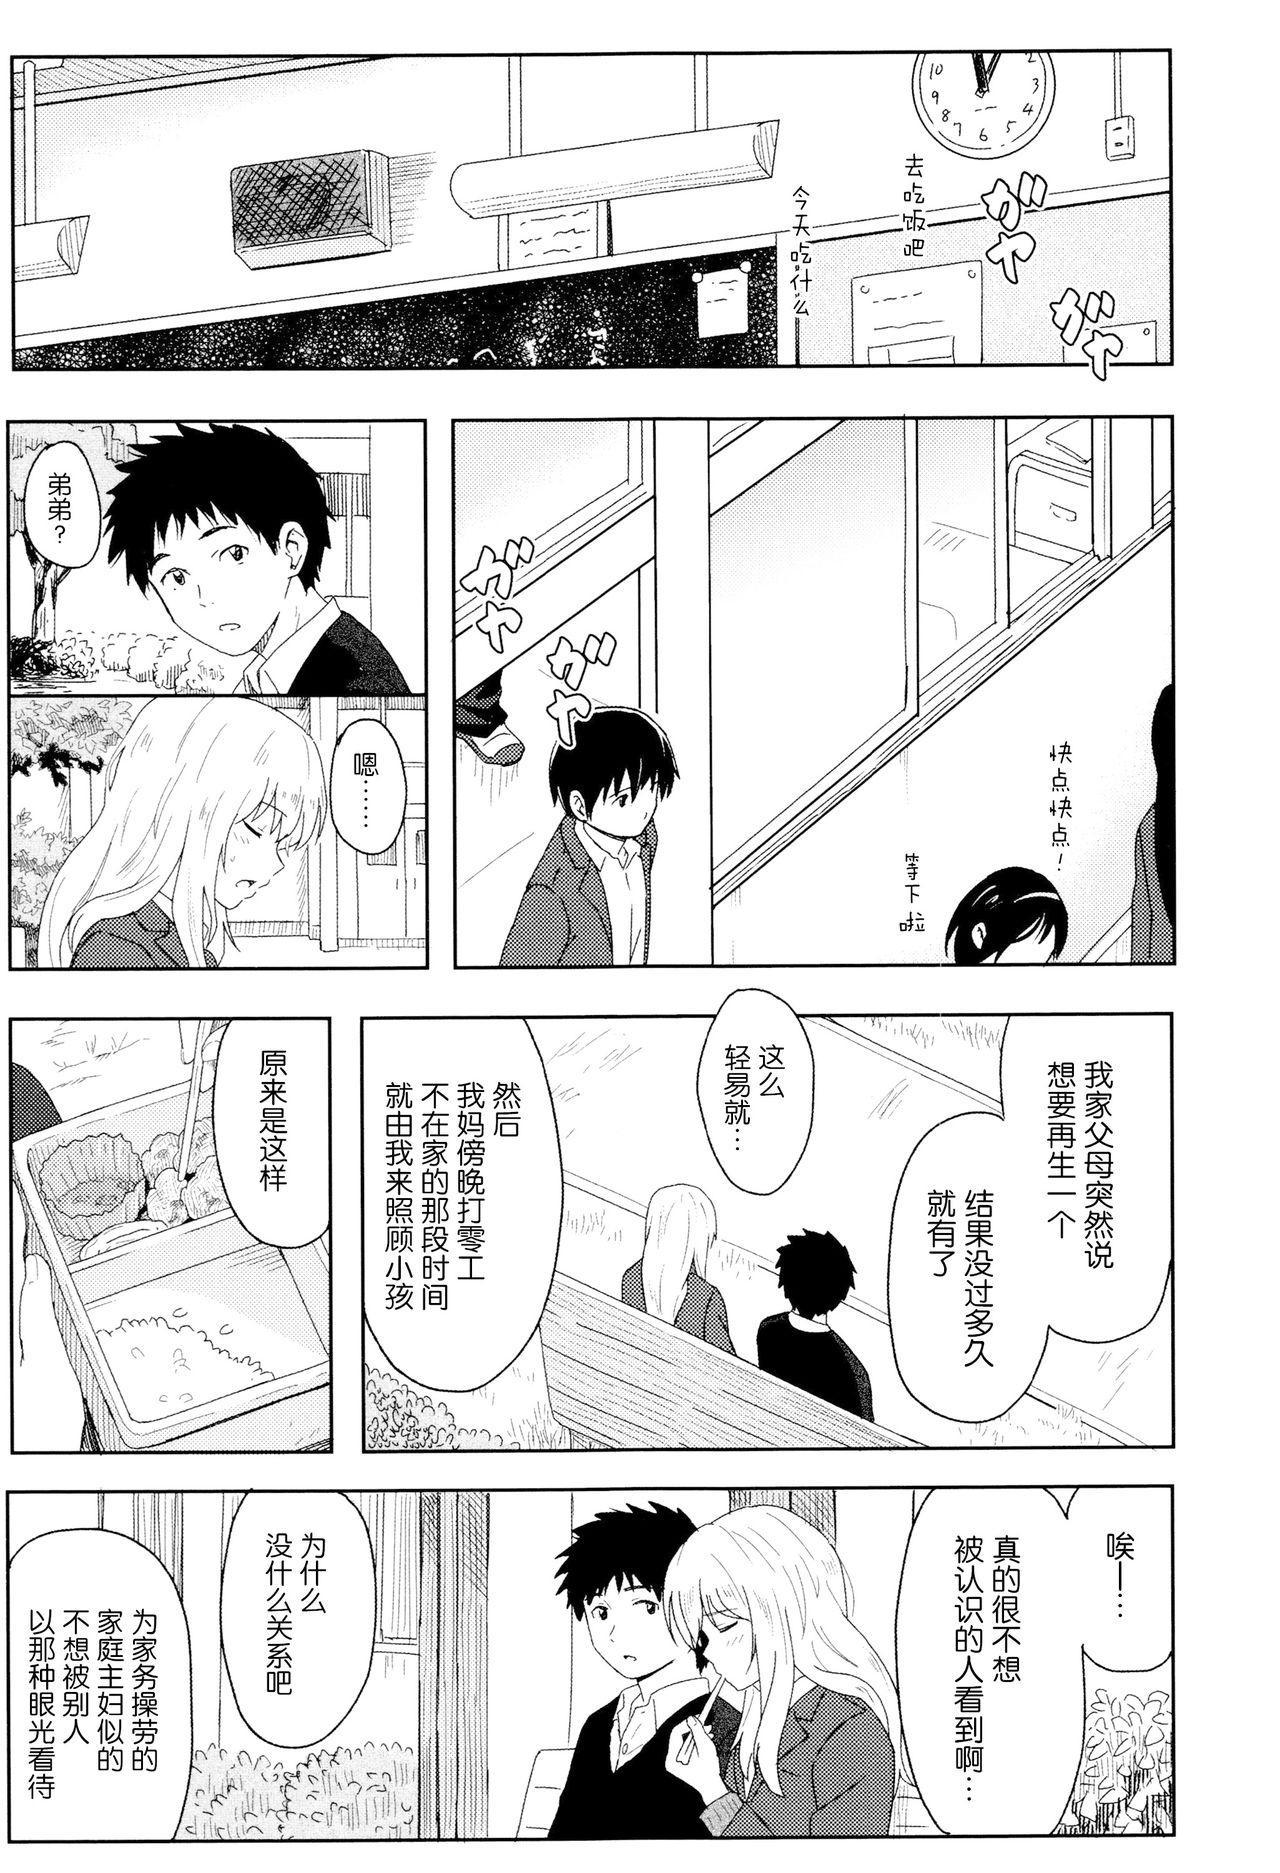 Tokubetsu na Mainichi - Special daily 11